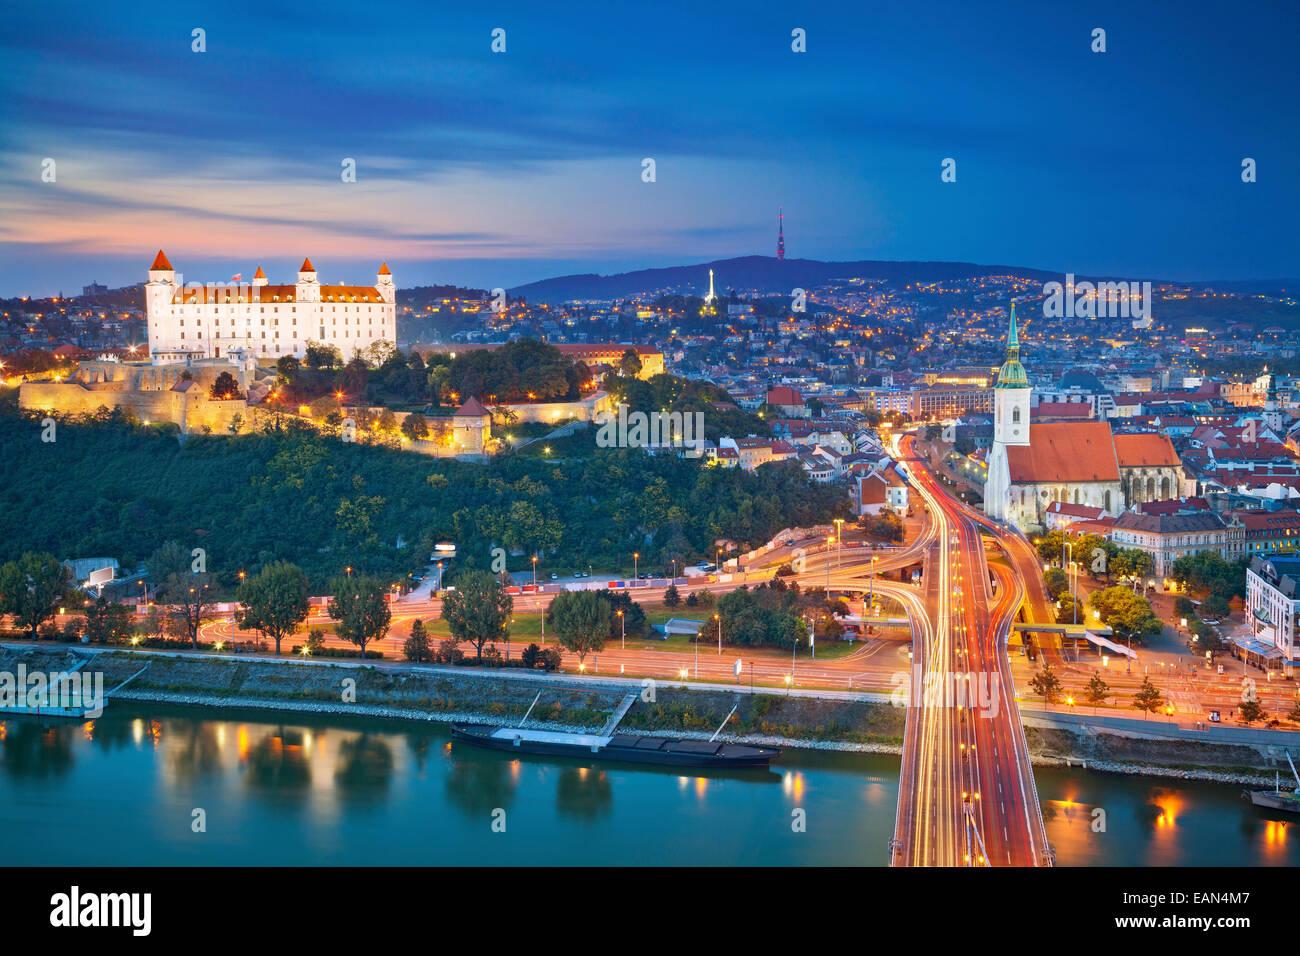 Bratislava, Slovakia. Image of Bratislava, the capital city of Slovakia. - Stock Image